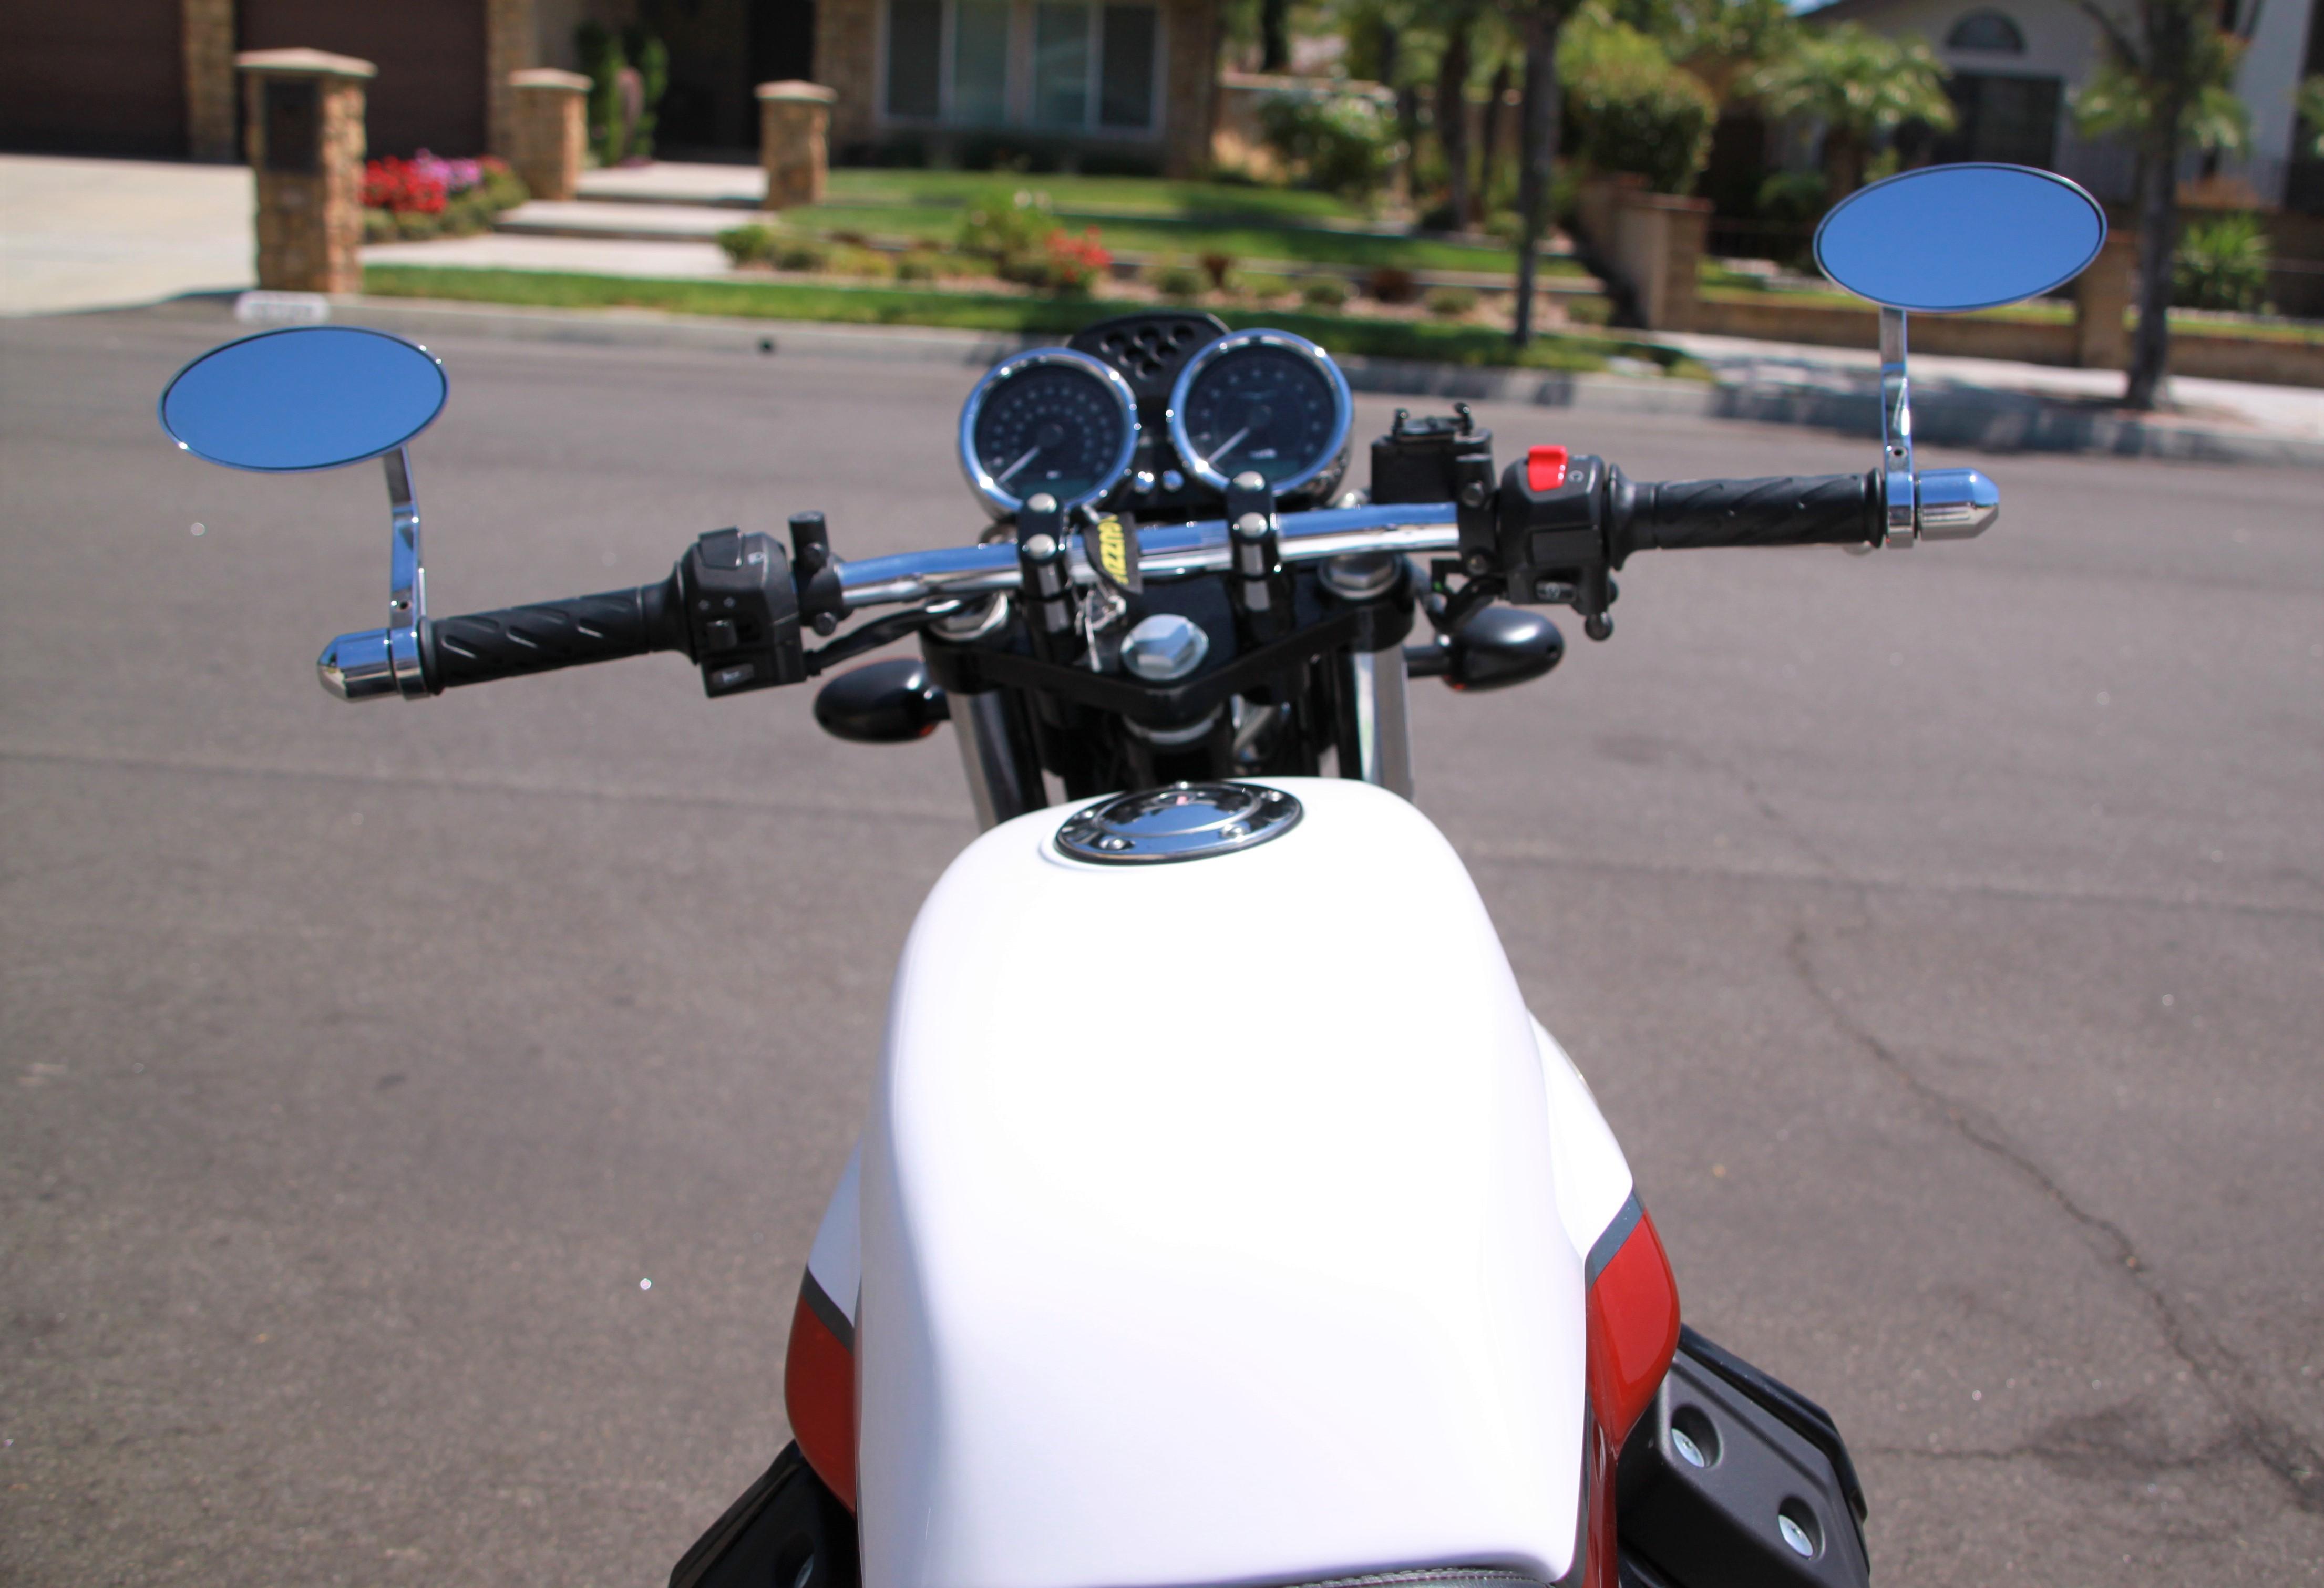 Ducati ms - The Ultimate Ducati Forum - View Single Post